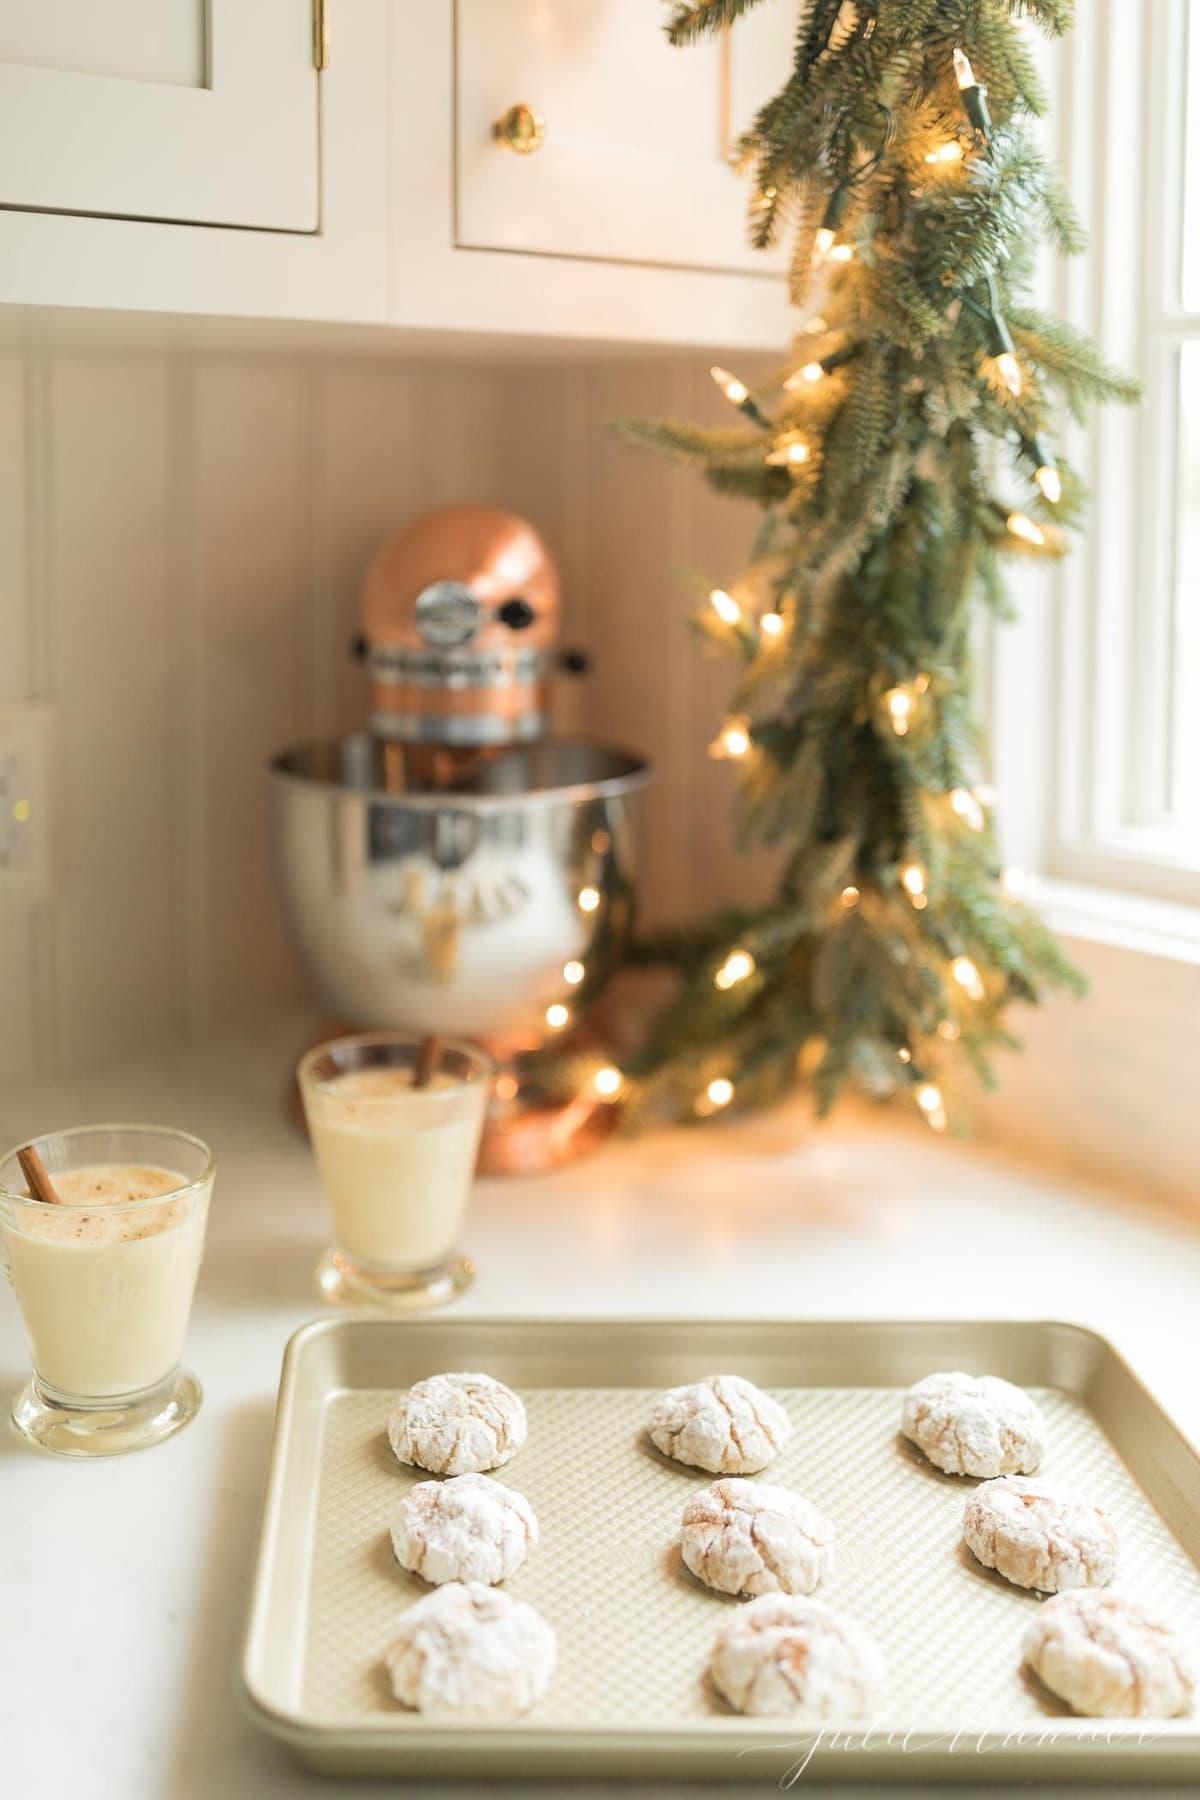 eggnog gooey butter cookies on a kitchen counter top